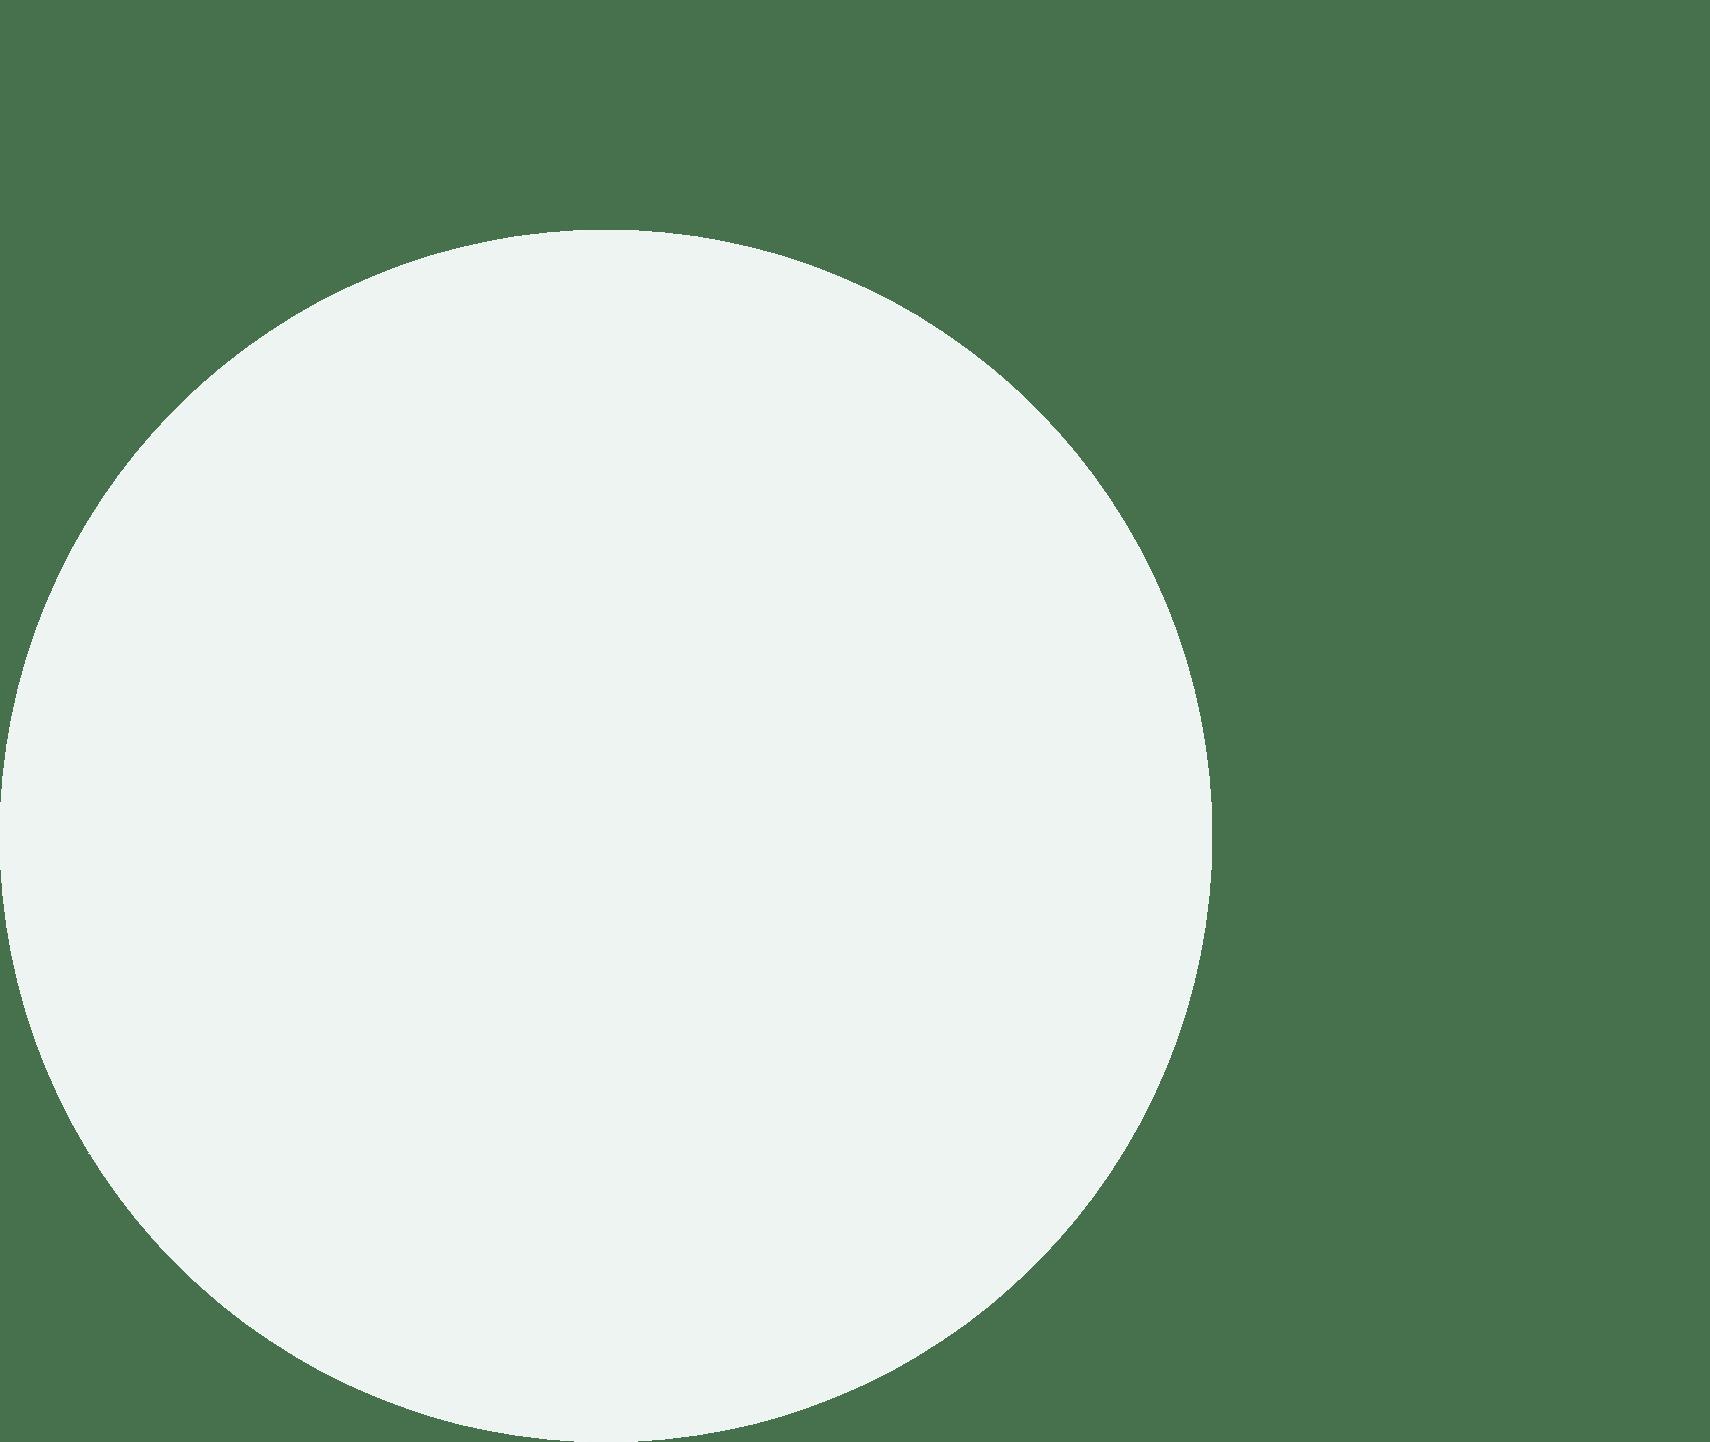 Circle-green-eight-min